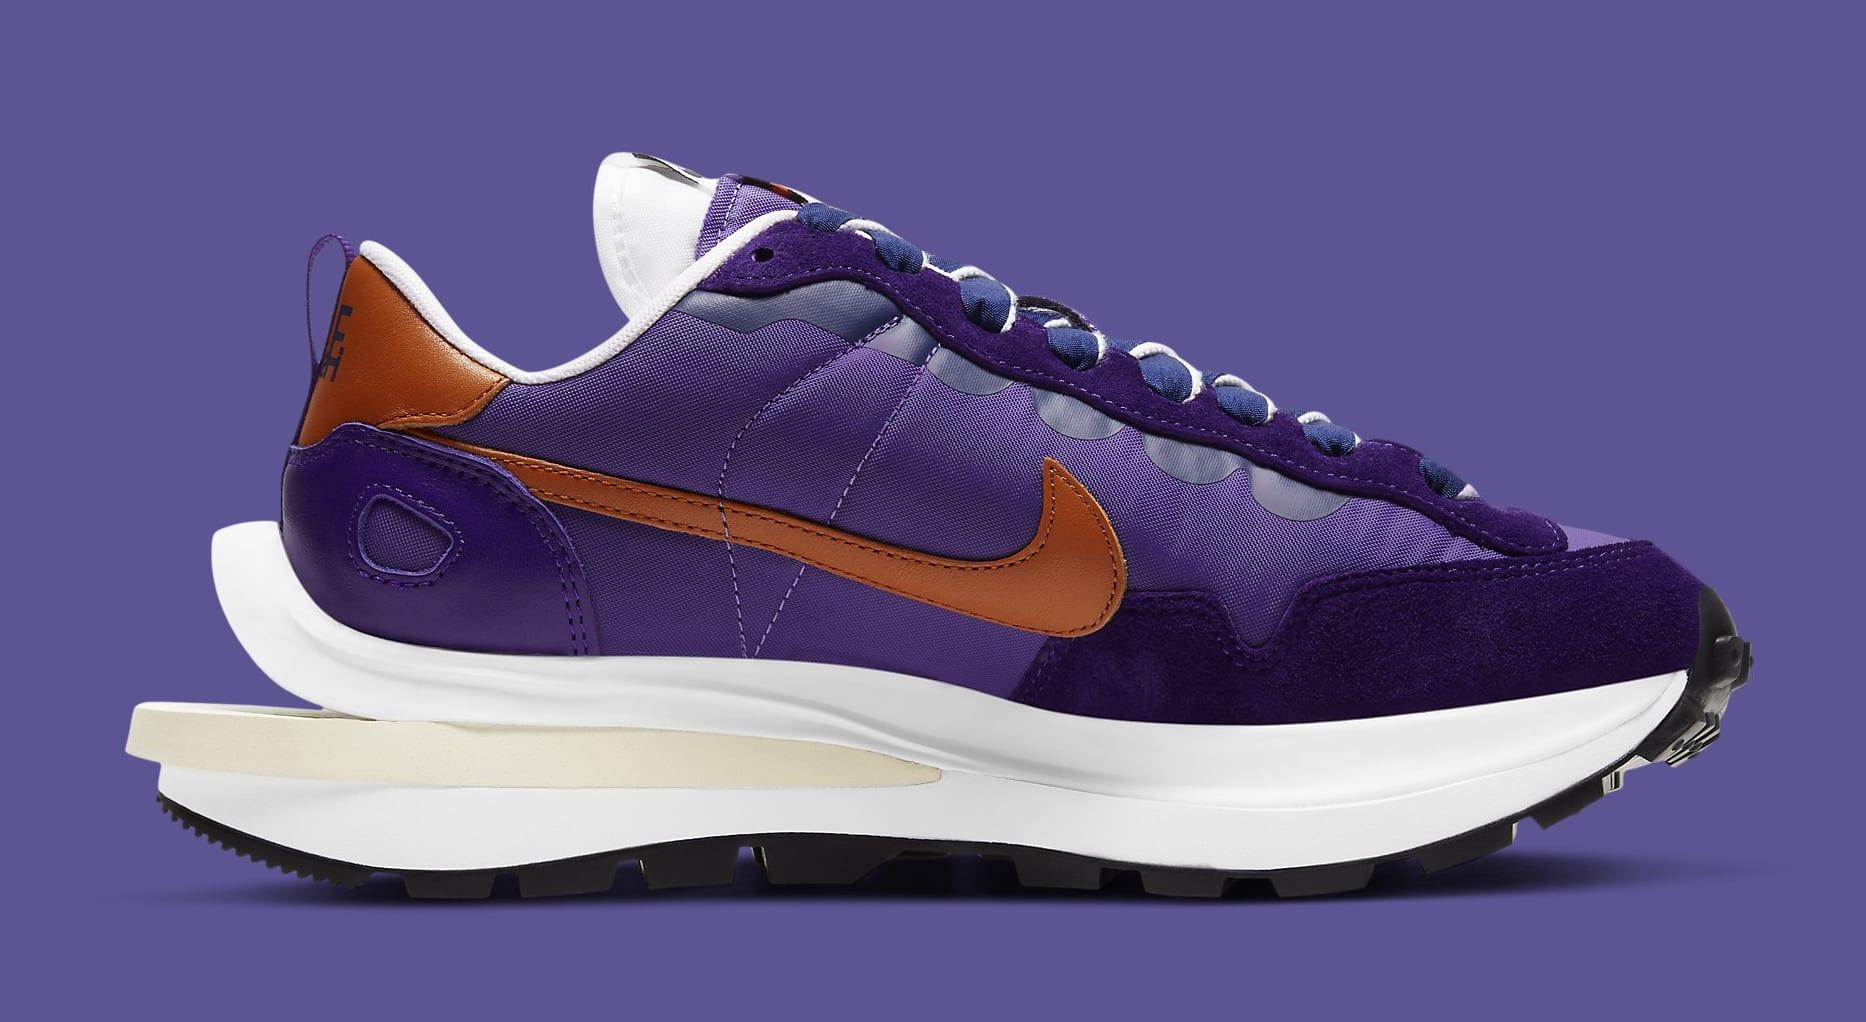 Sacai x Nike VaporWaffle 'Dark Iris' DD1875-500 Medial